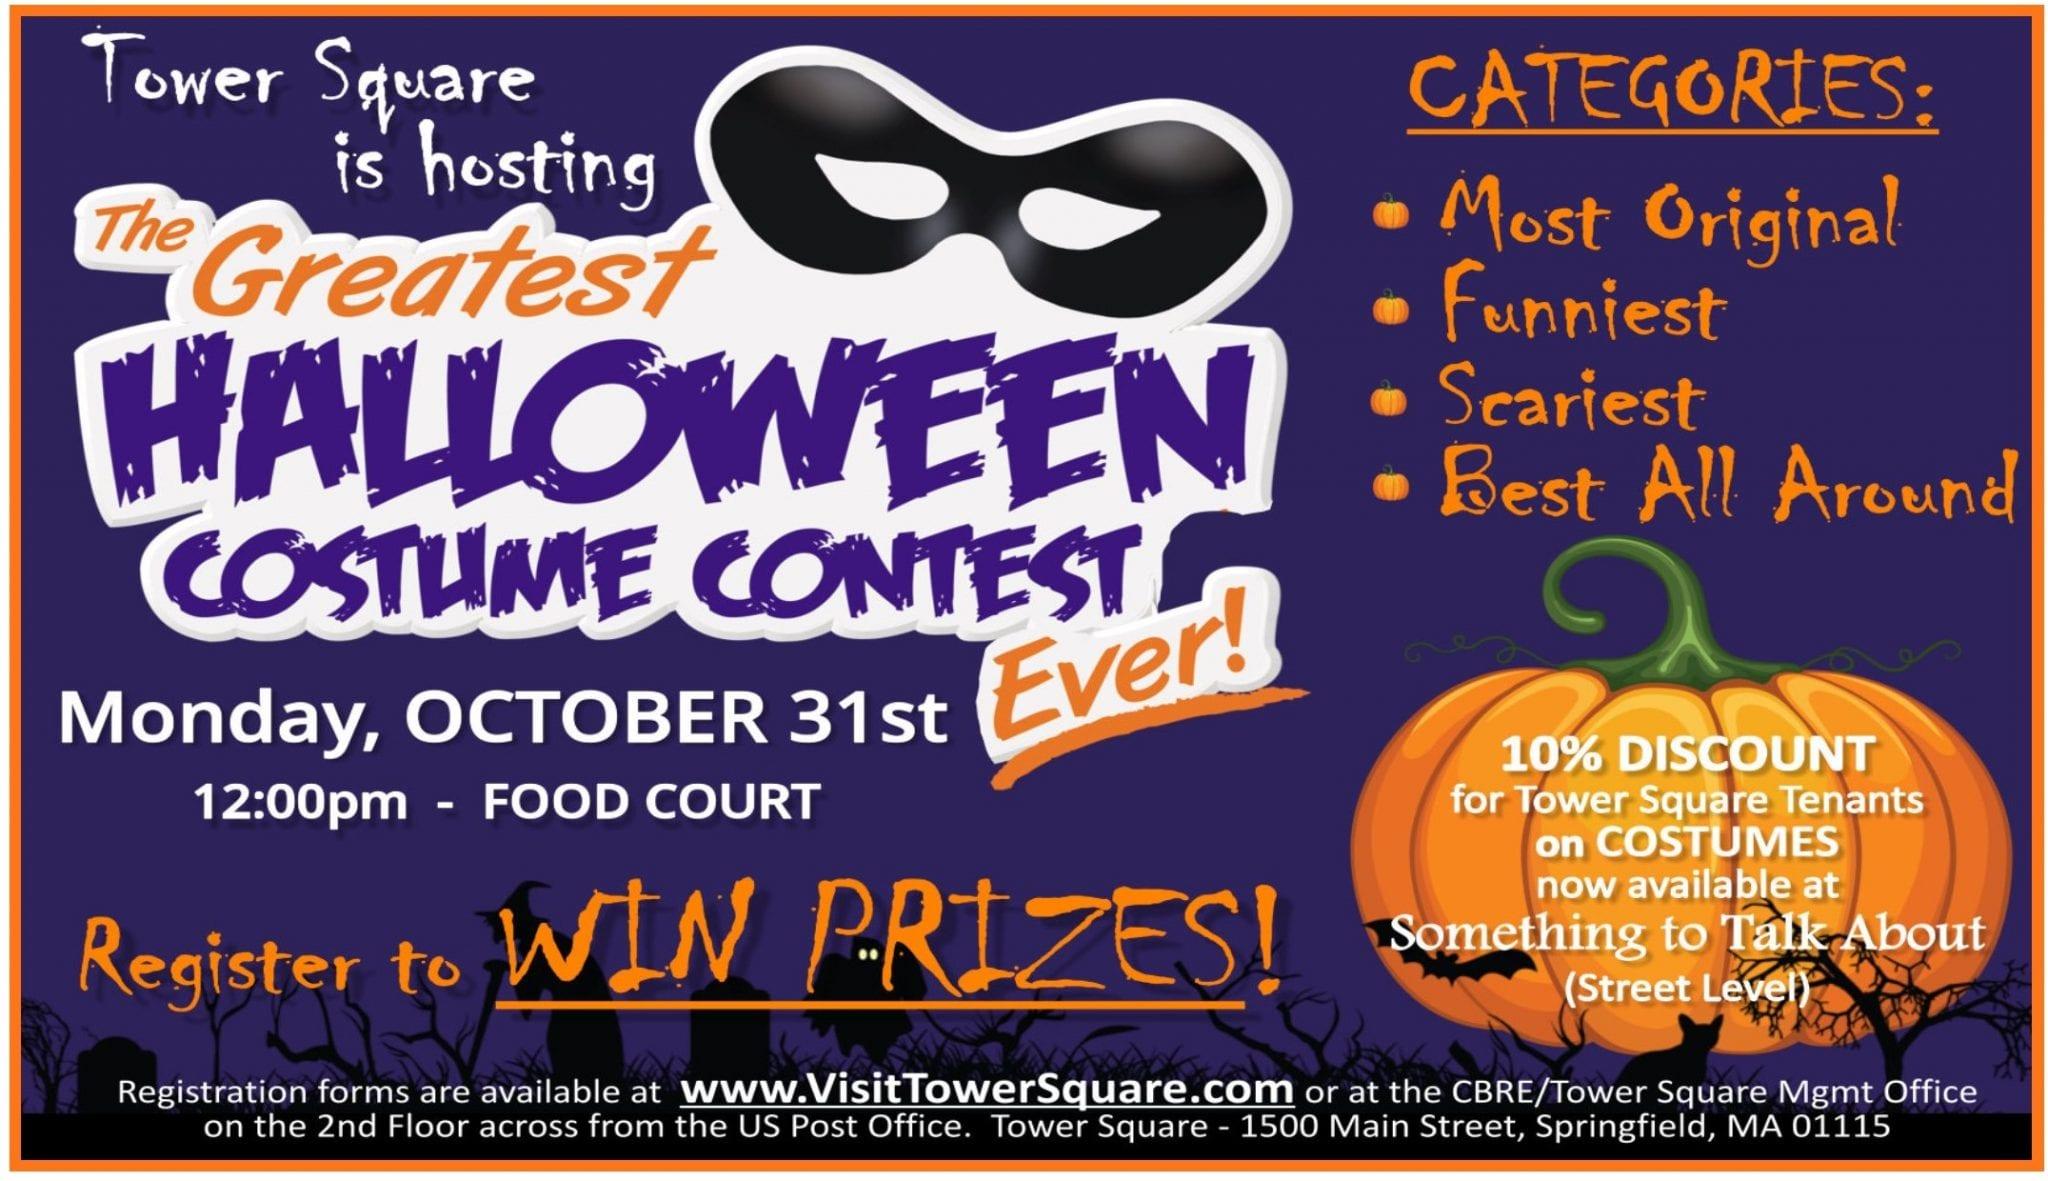 Halloween Costume Contest  sc 1 st  Springfield Business Improvement District & Halloween Costume Contest - Springfield BID